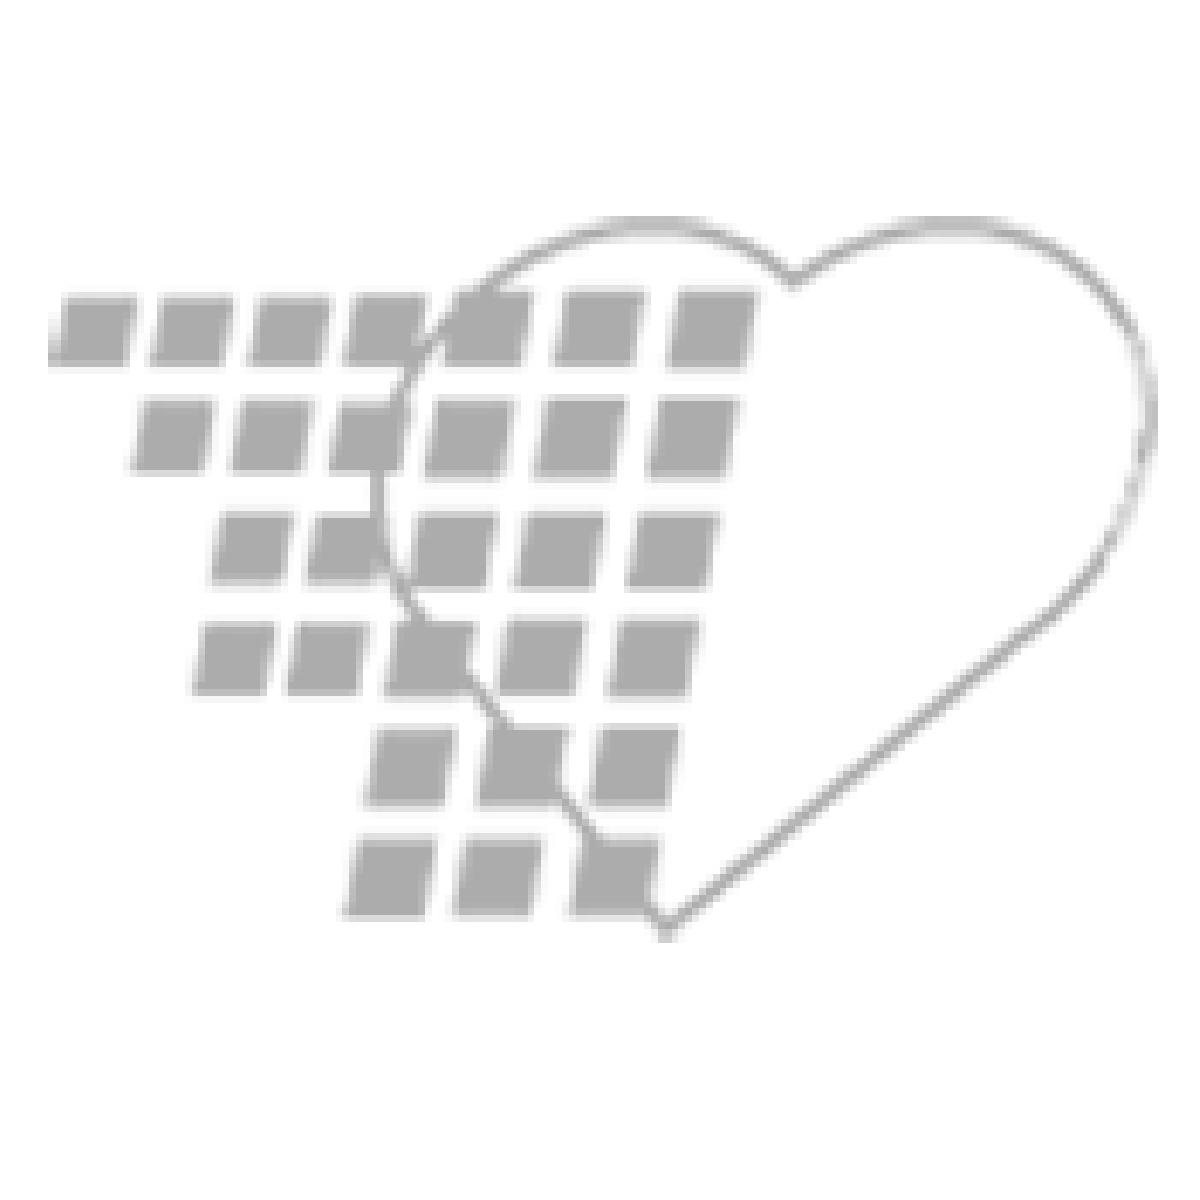 10-81-3508 Fetal Monitoring and Labor Progress Model